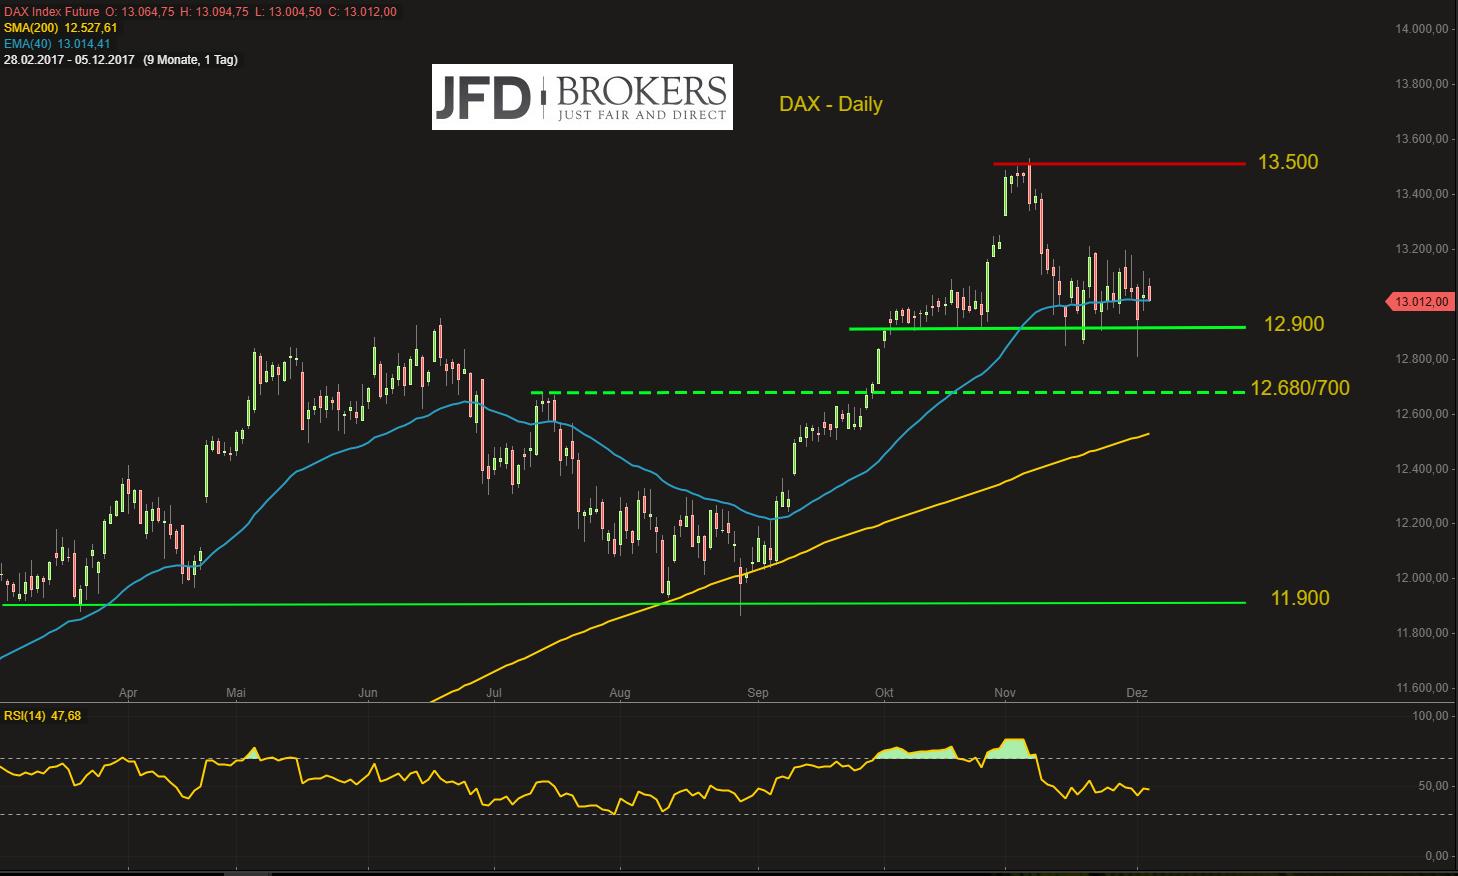 DAX-sorgenvoller-Blick-in-Richtung-des-US-Technologie-Sektors-Kommentar-JFD-Brokers-GodmodeTrader.de-2